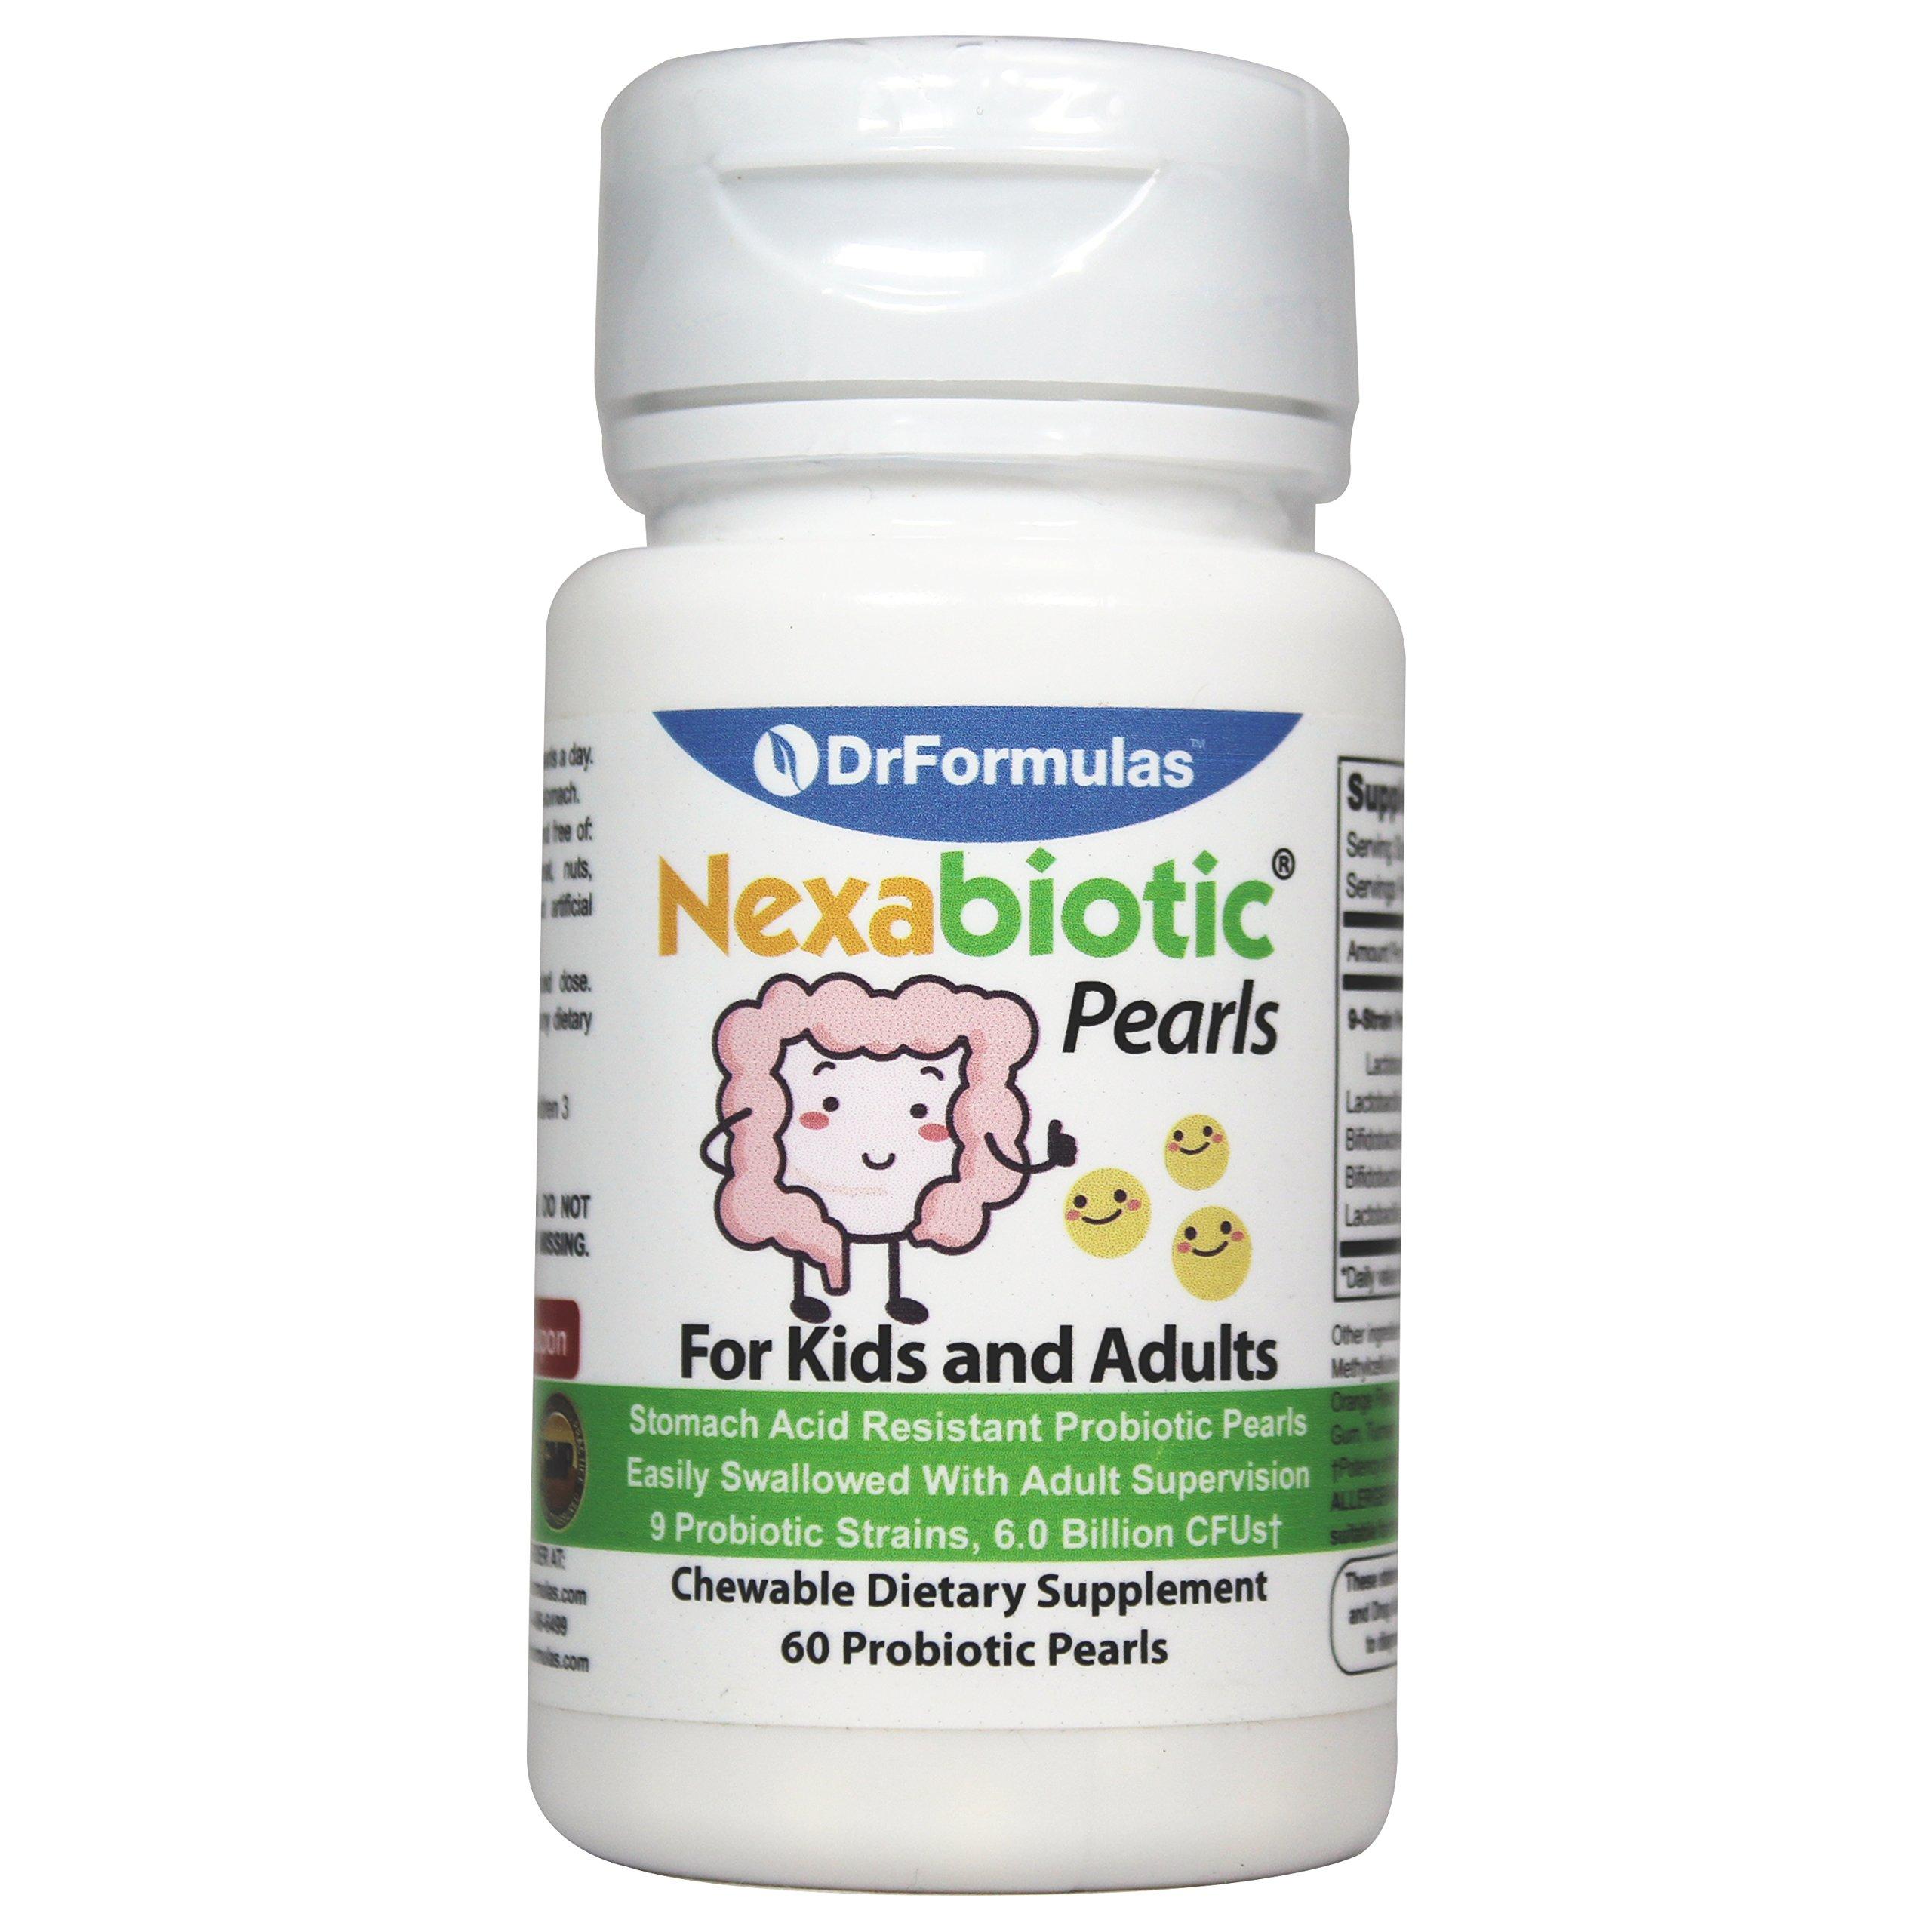 DrFormulas Nexabiotic Probiotic for Kids and Adults 6 Billion CFUs with Bifidobacterium infantis, Lactobacillus Acidophilus Probiotics, 60 Tiny Easy to Swallow Pearls (not Chewable Gummies or Powder)